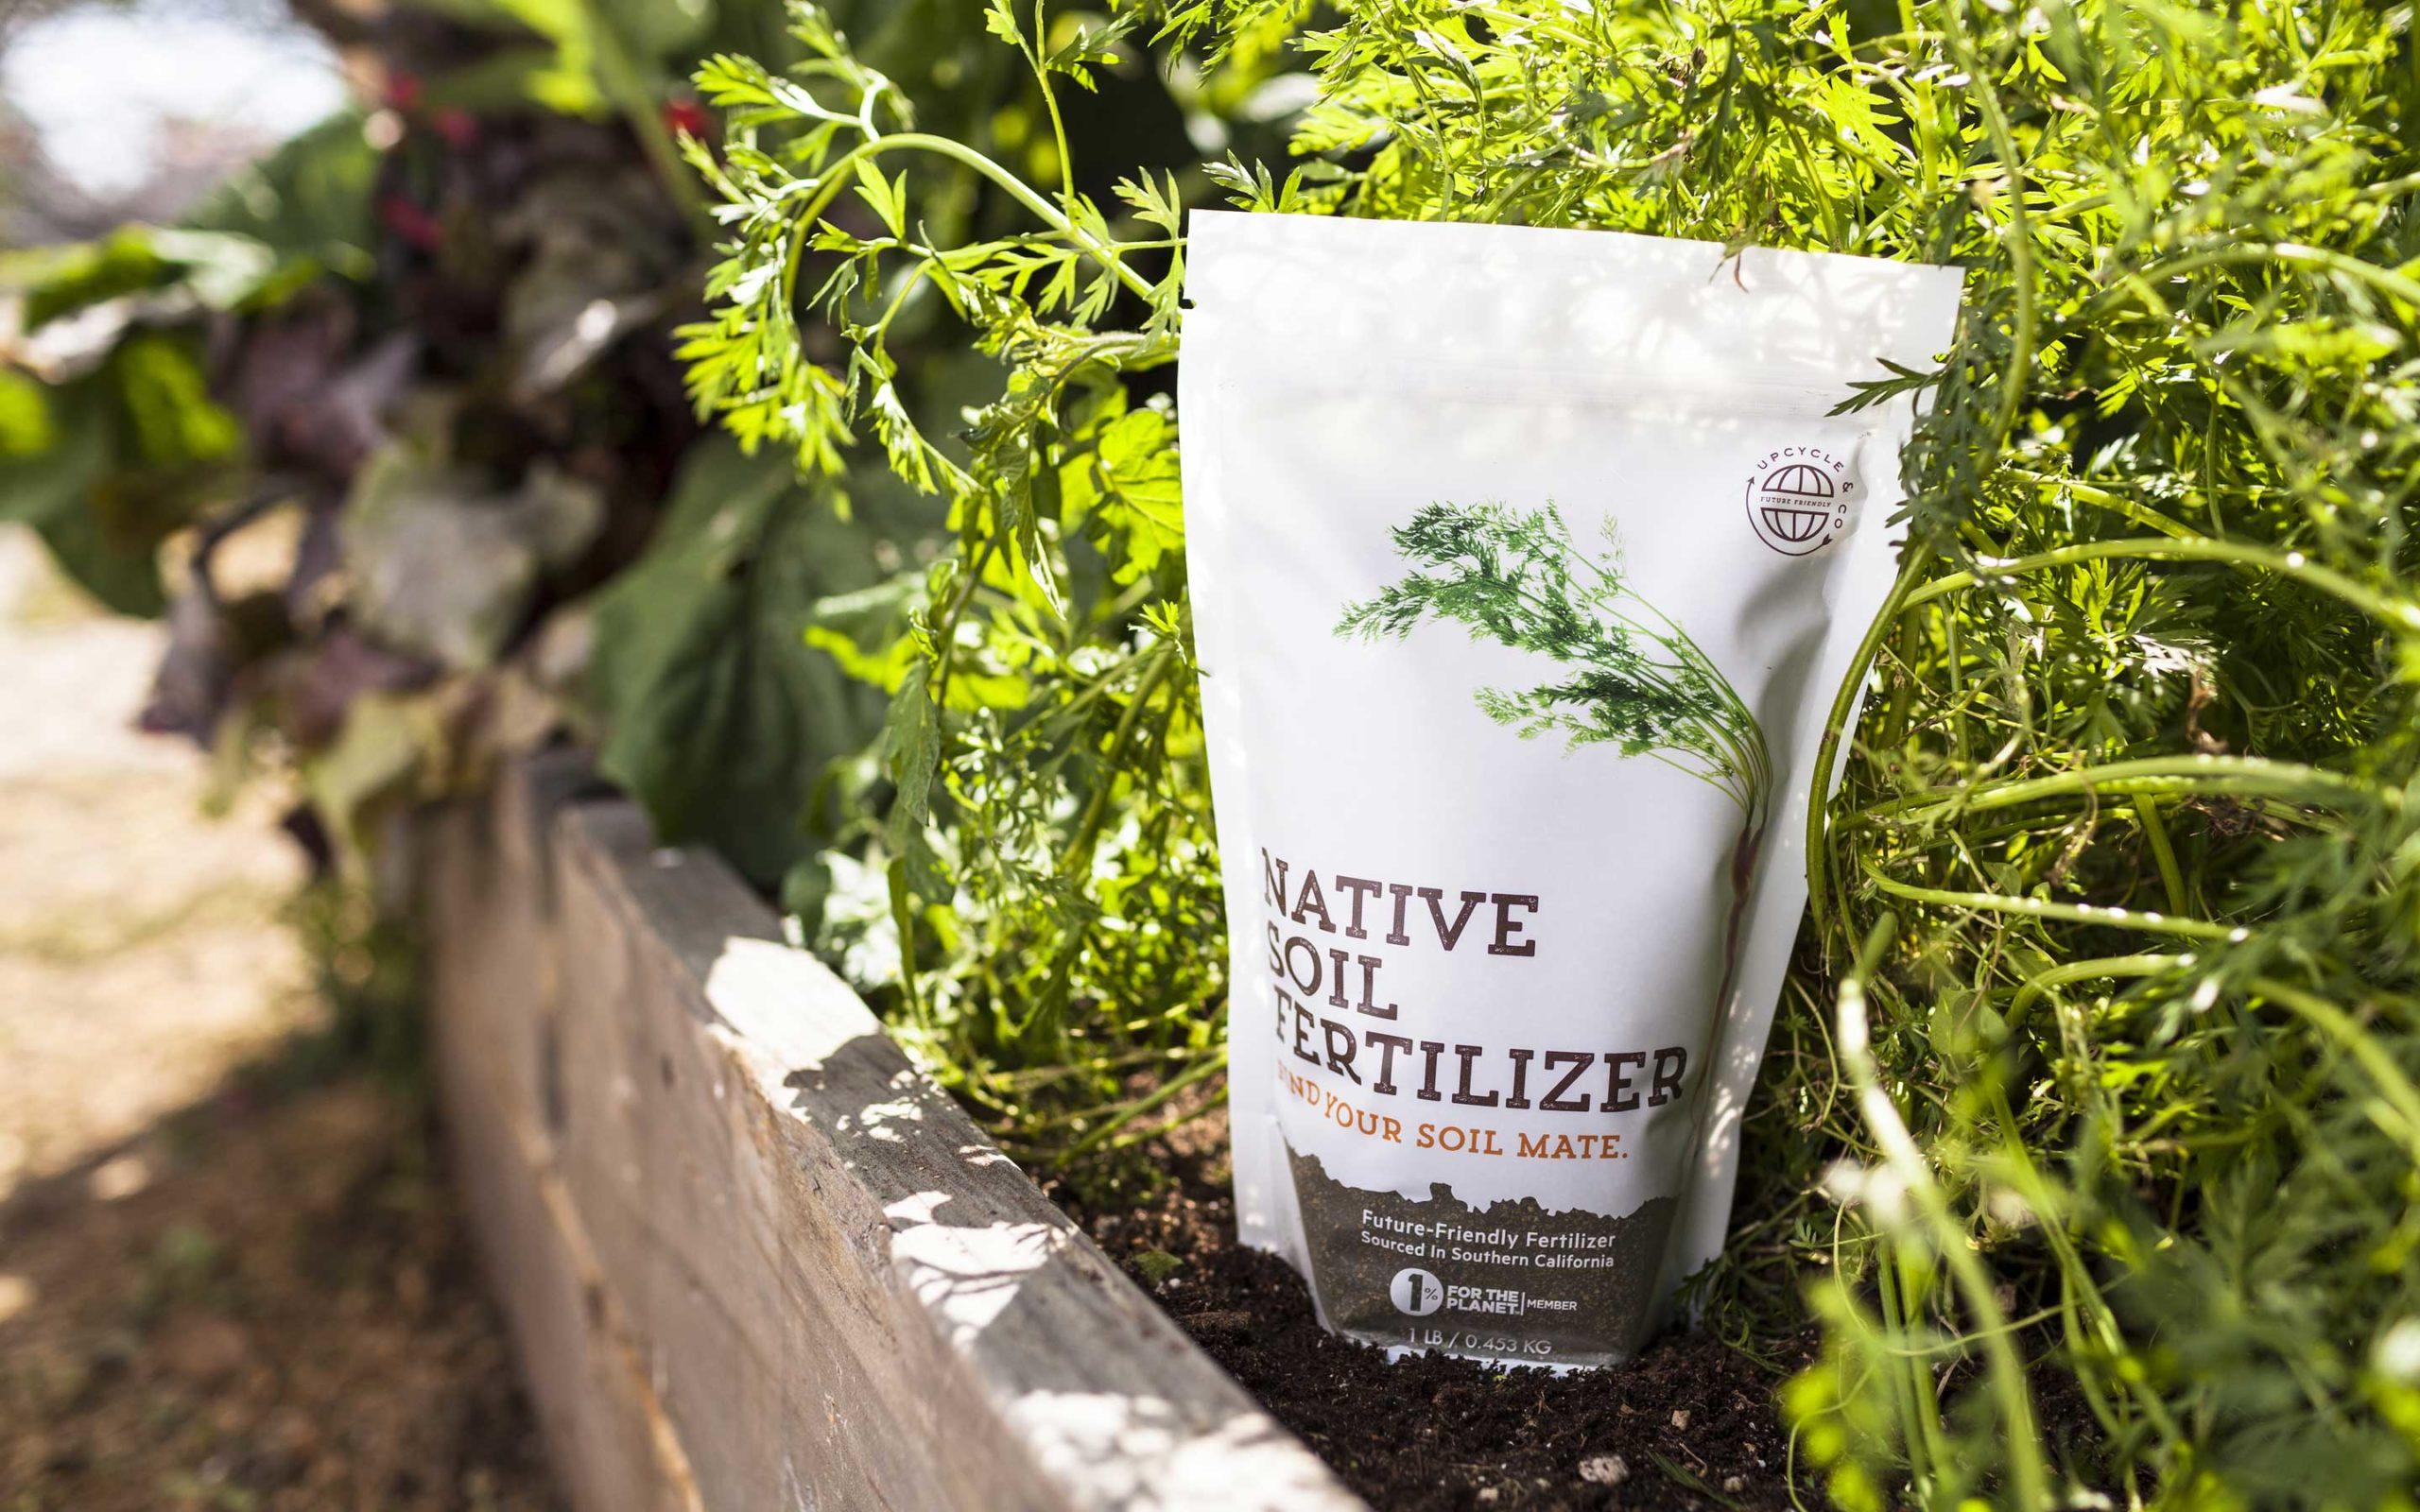 Native Soil Fertilizer 1 Lb Bag